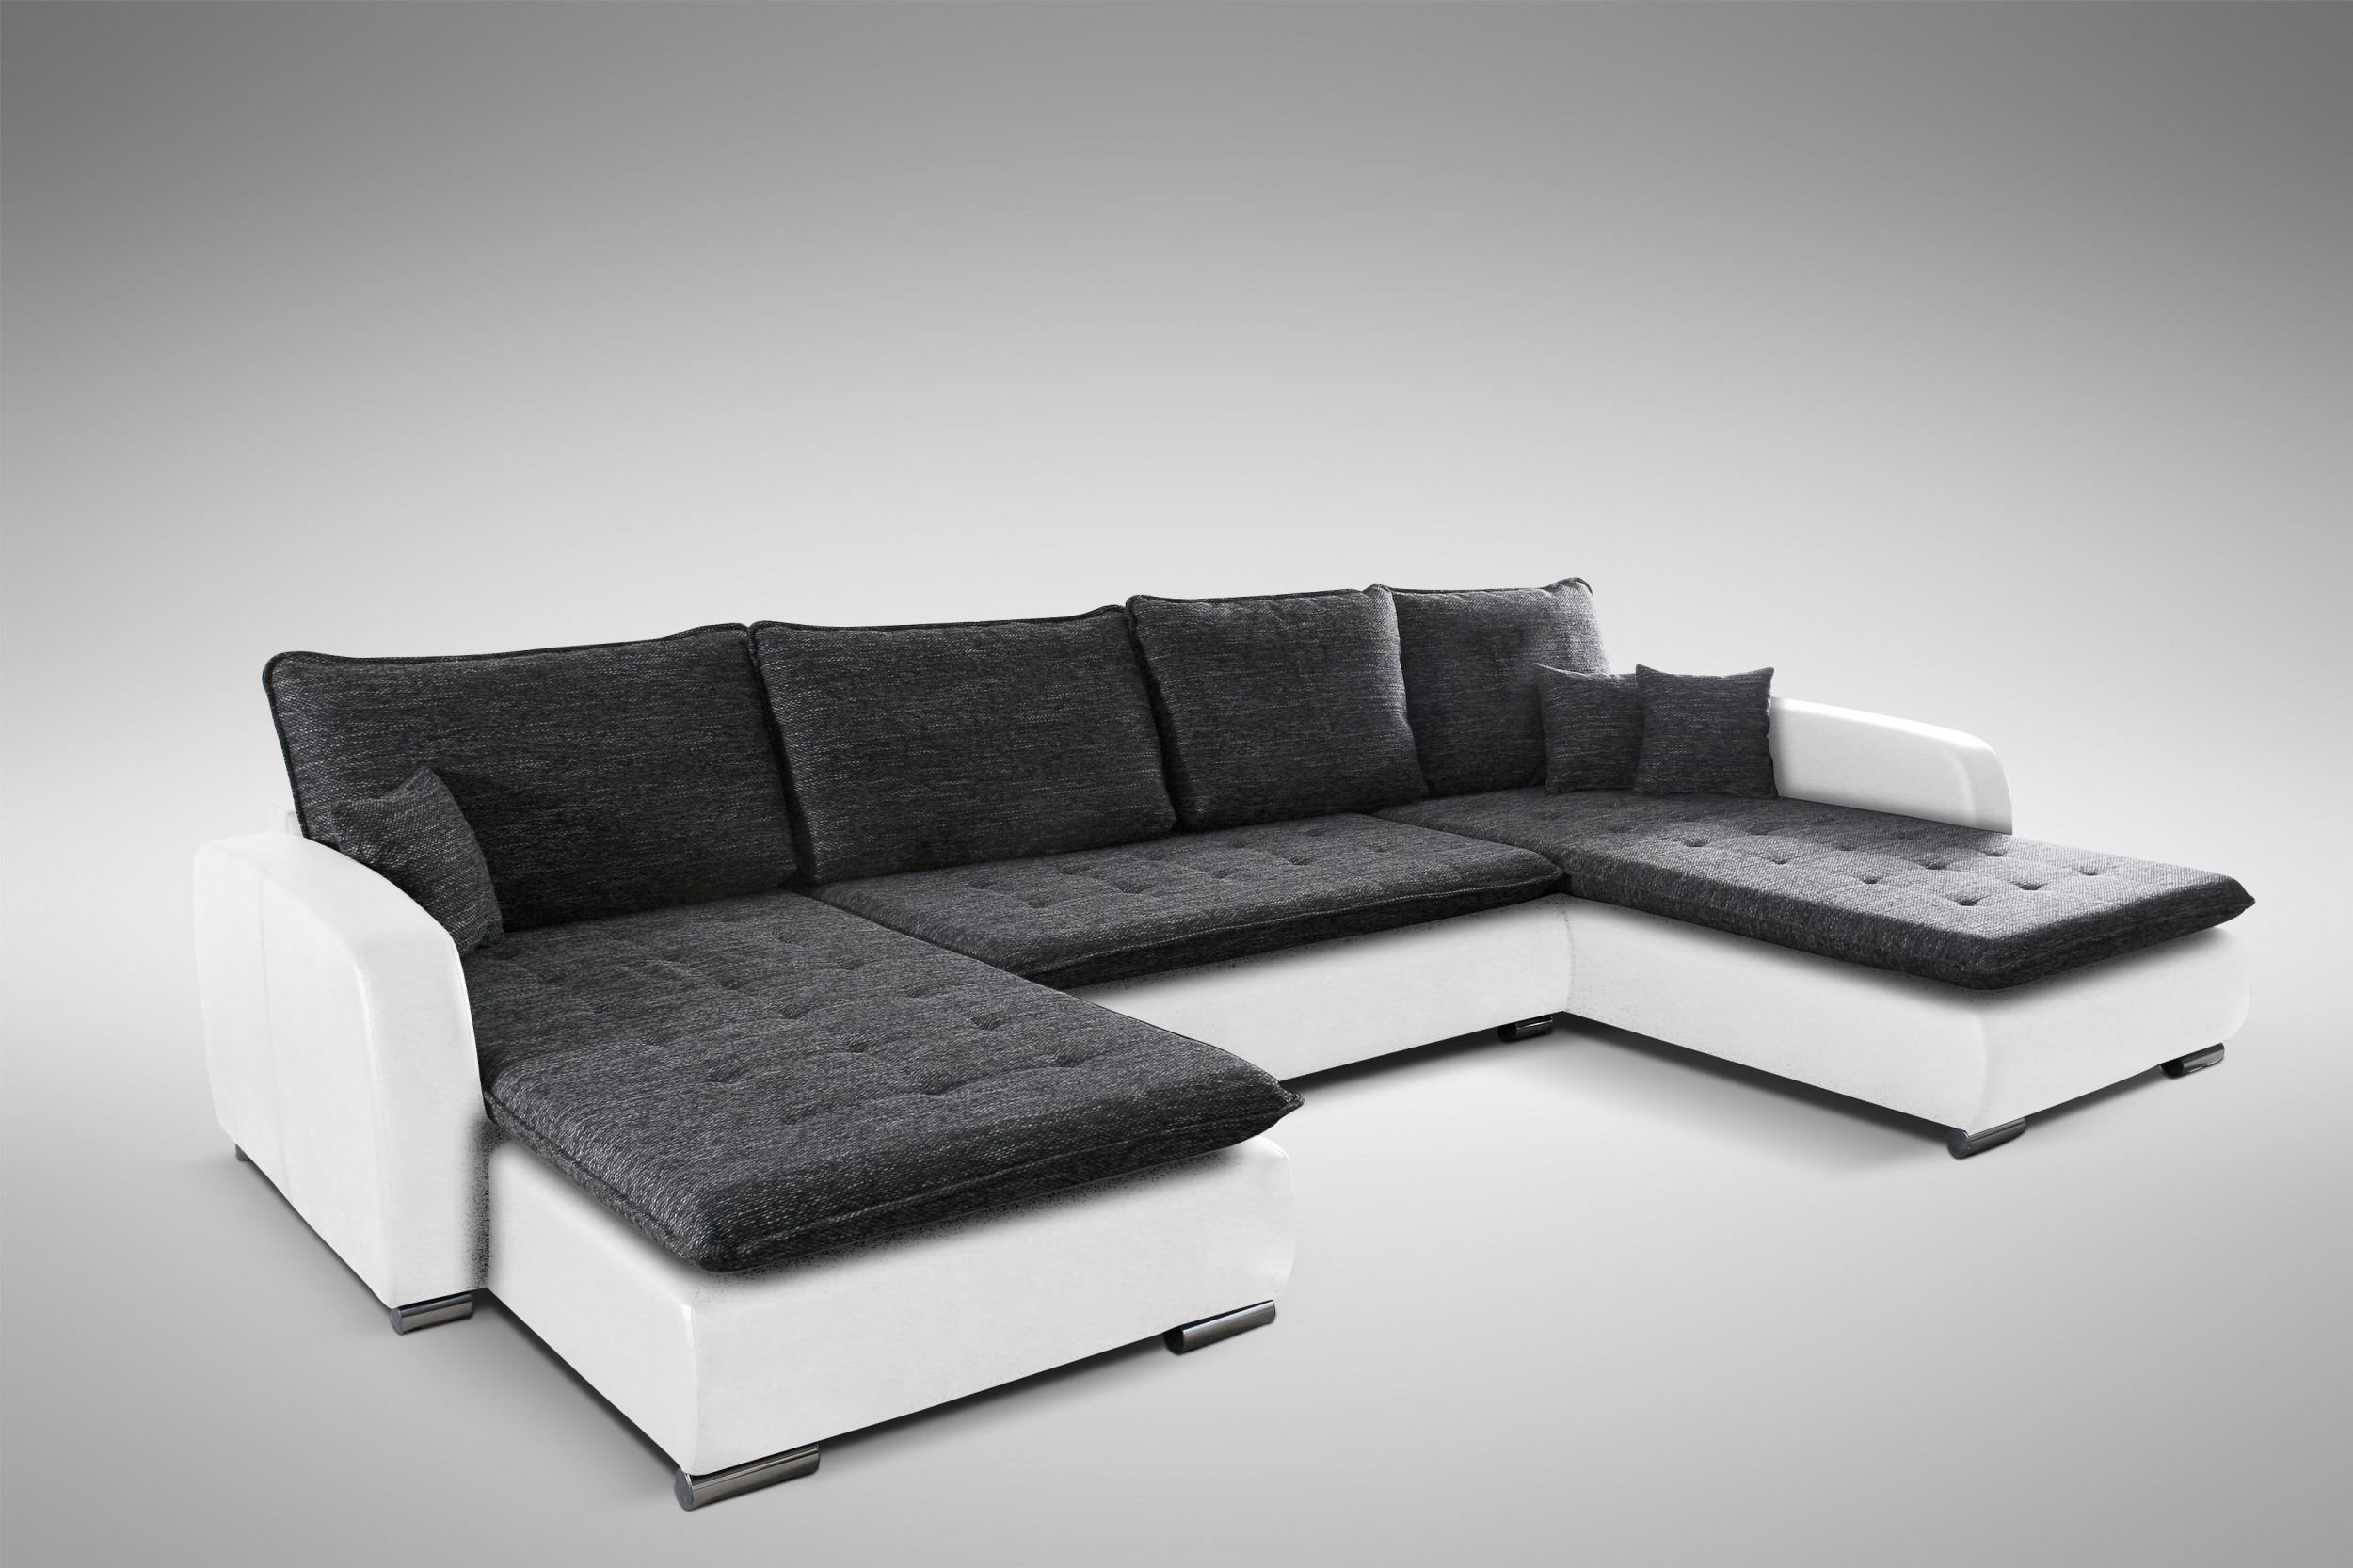 Schlafsofa sofa couch ecksofa eckcouch weiss schwarz for Schlafsofa ecksofa sofa couch inkl schlaffunktion